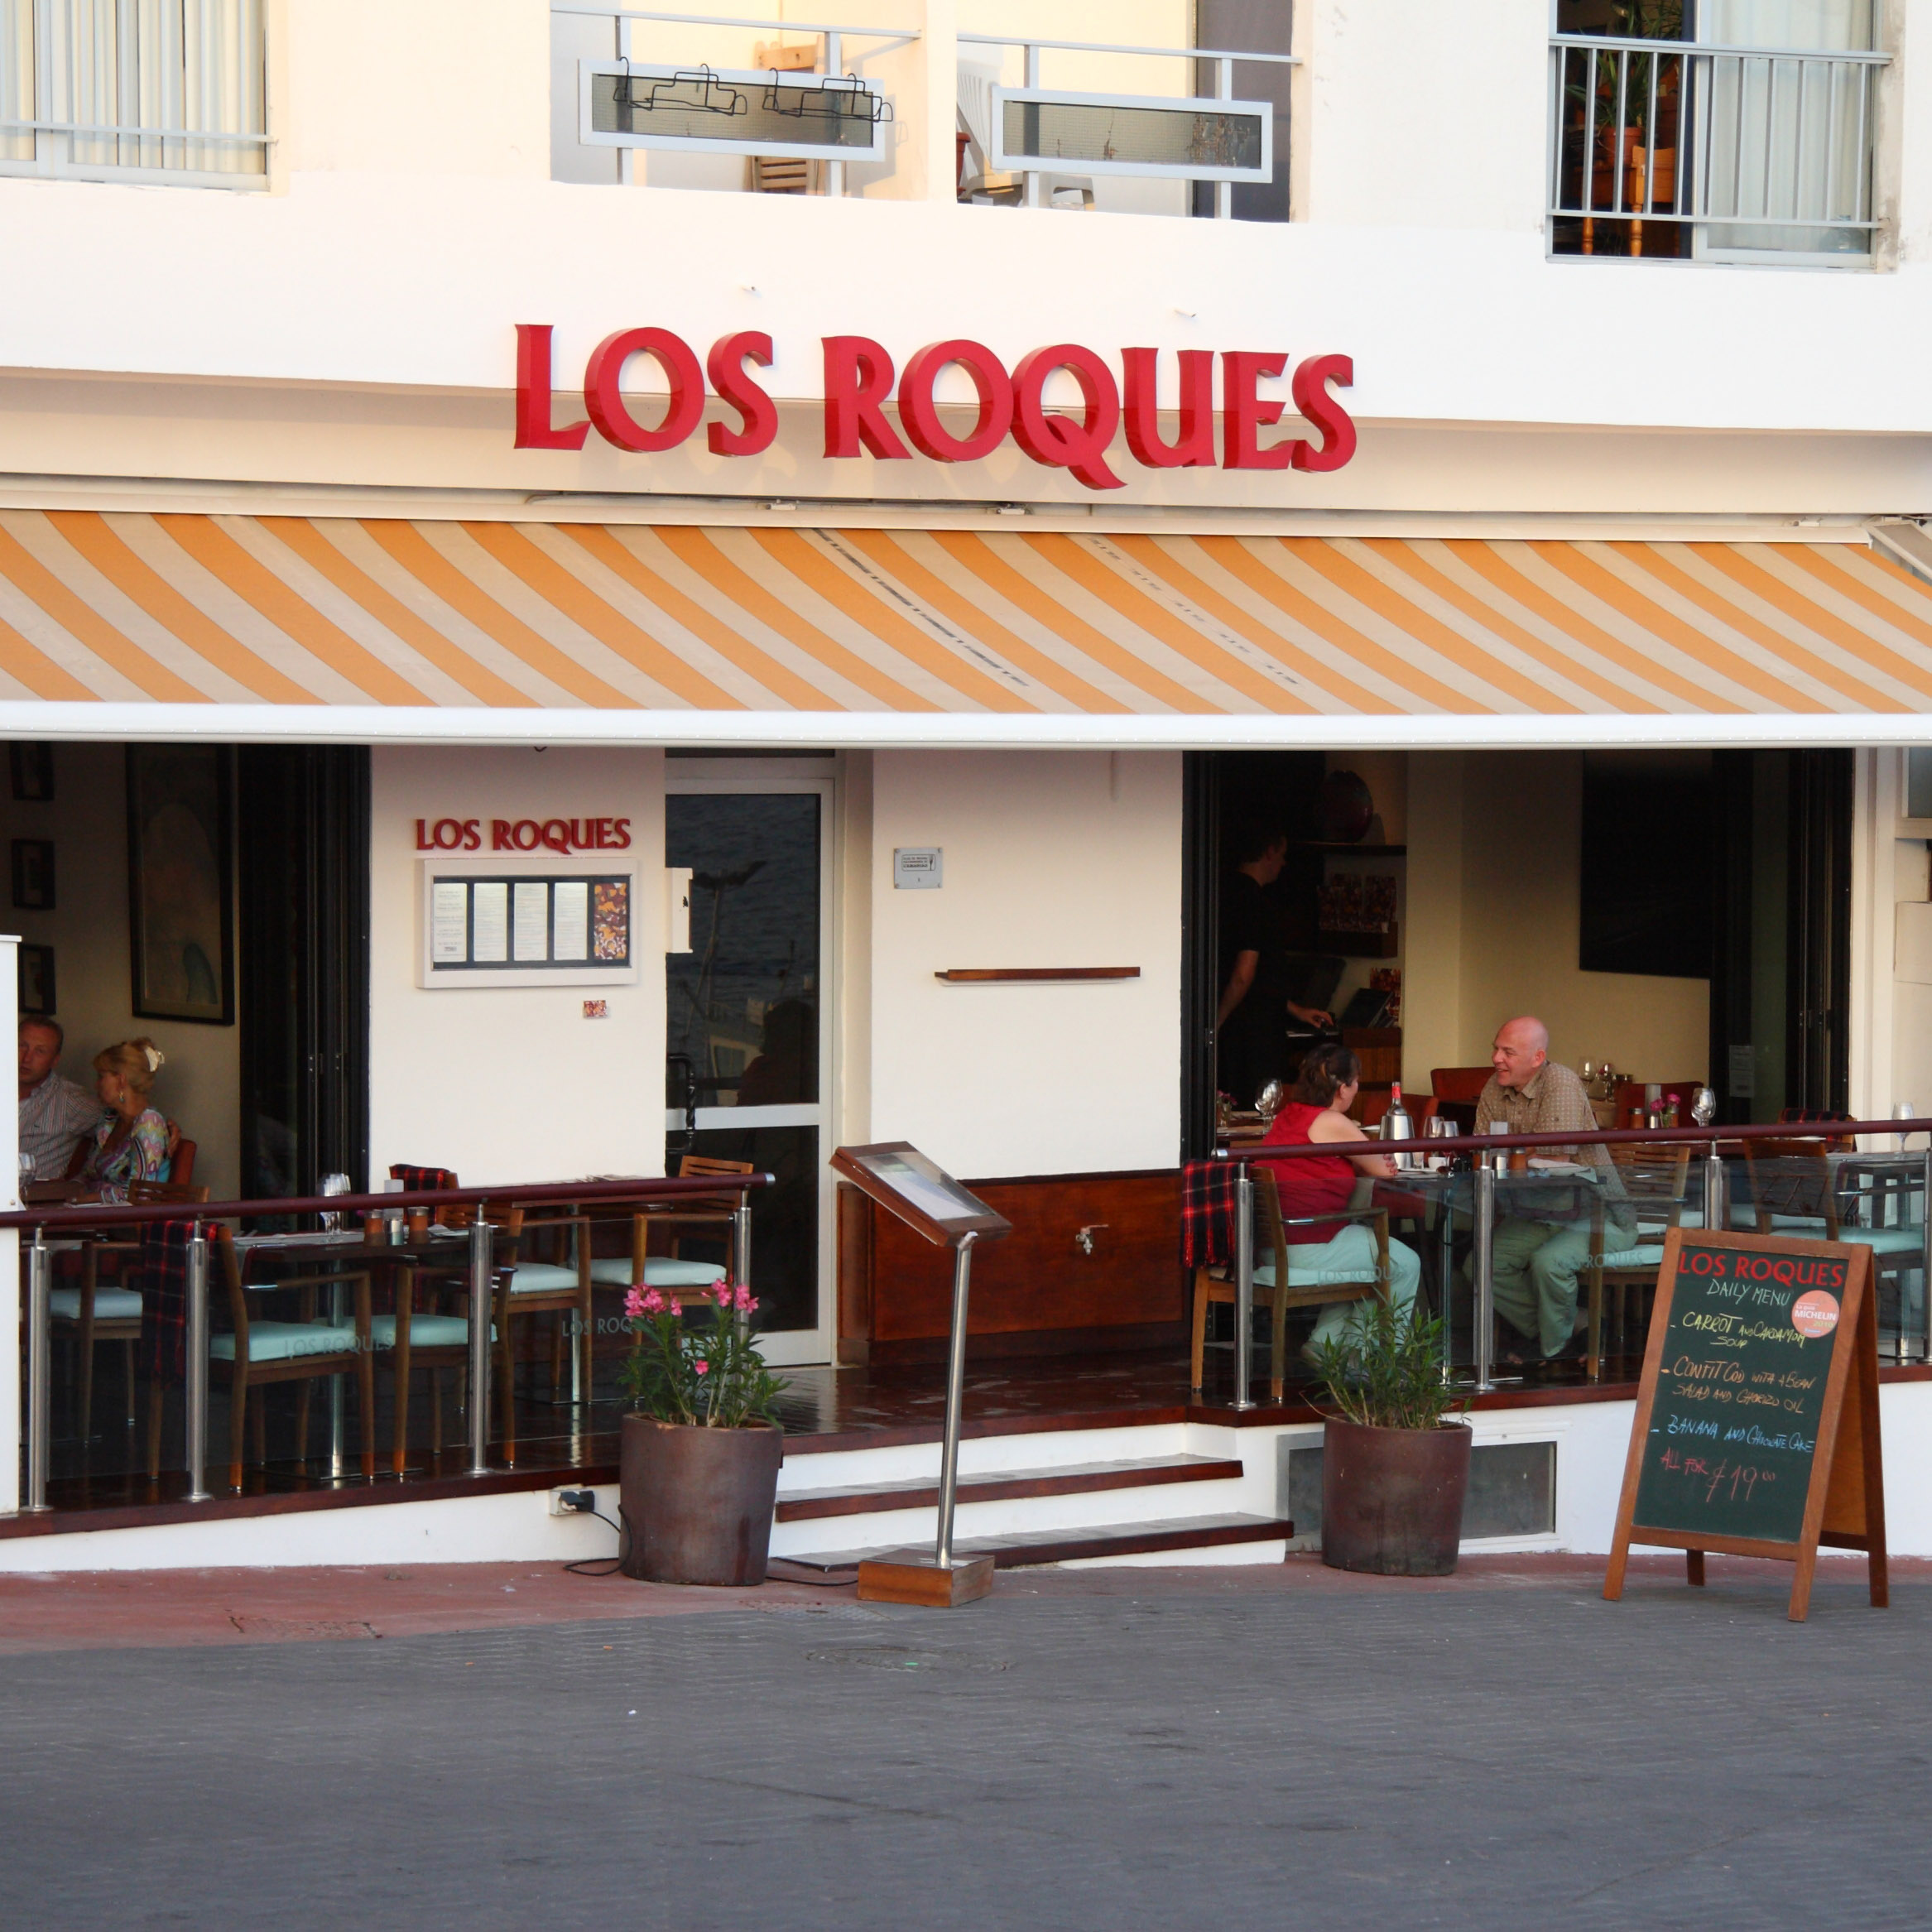 File Los Roques Restaurante Los Abrigos Tenerife 03 Jpg Wikimedia Commons